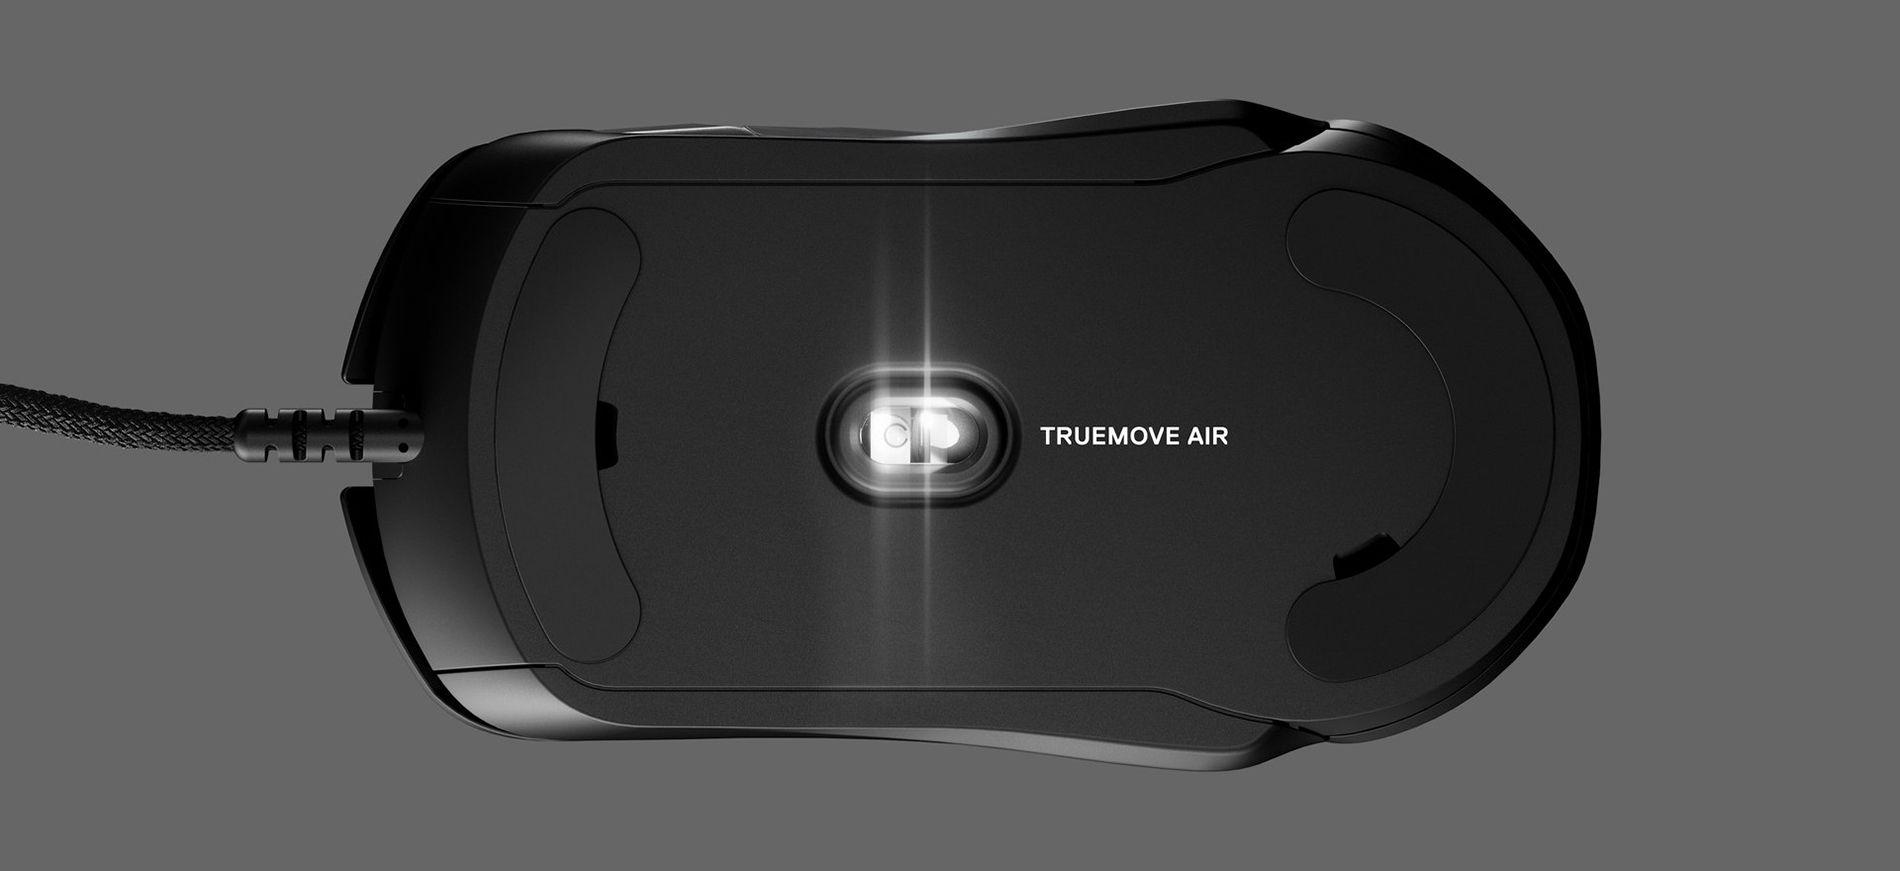 TrueMove Air